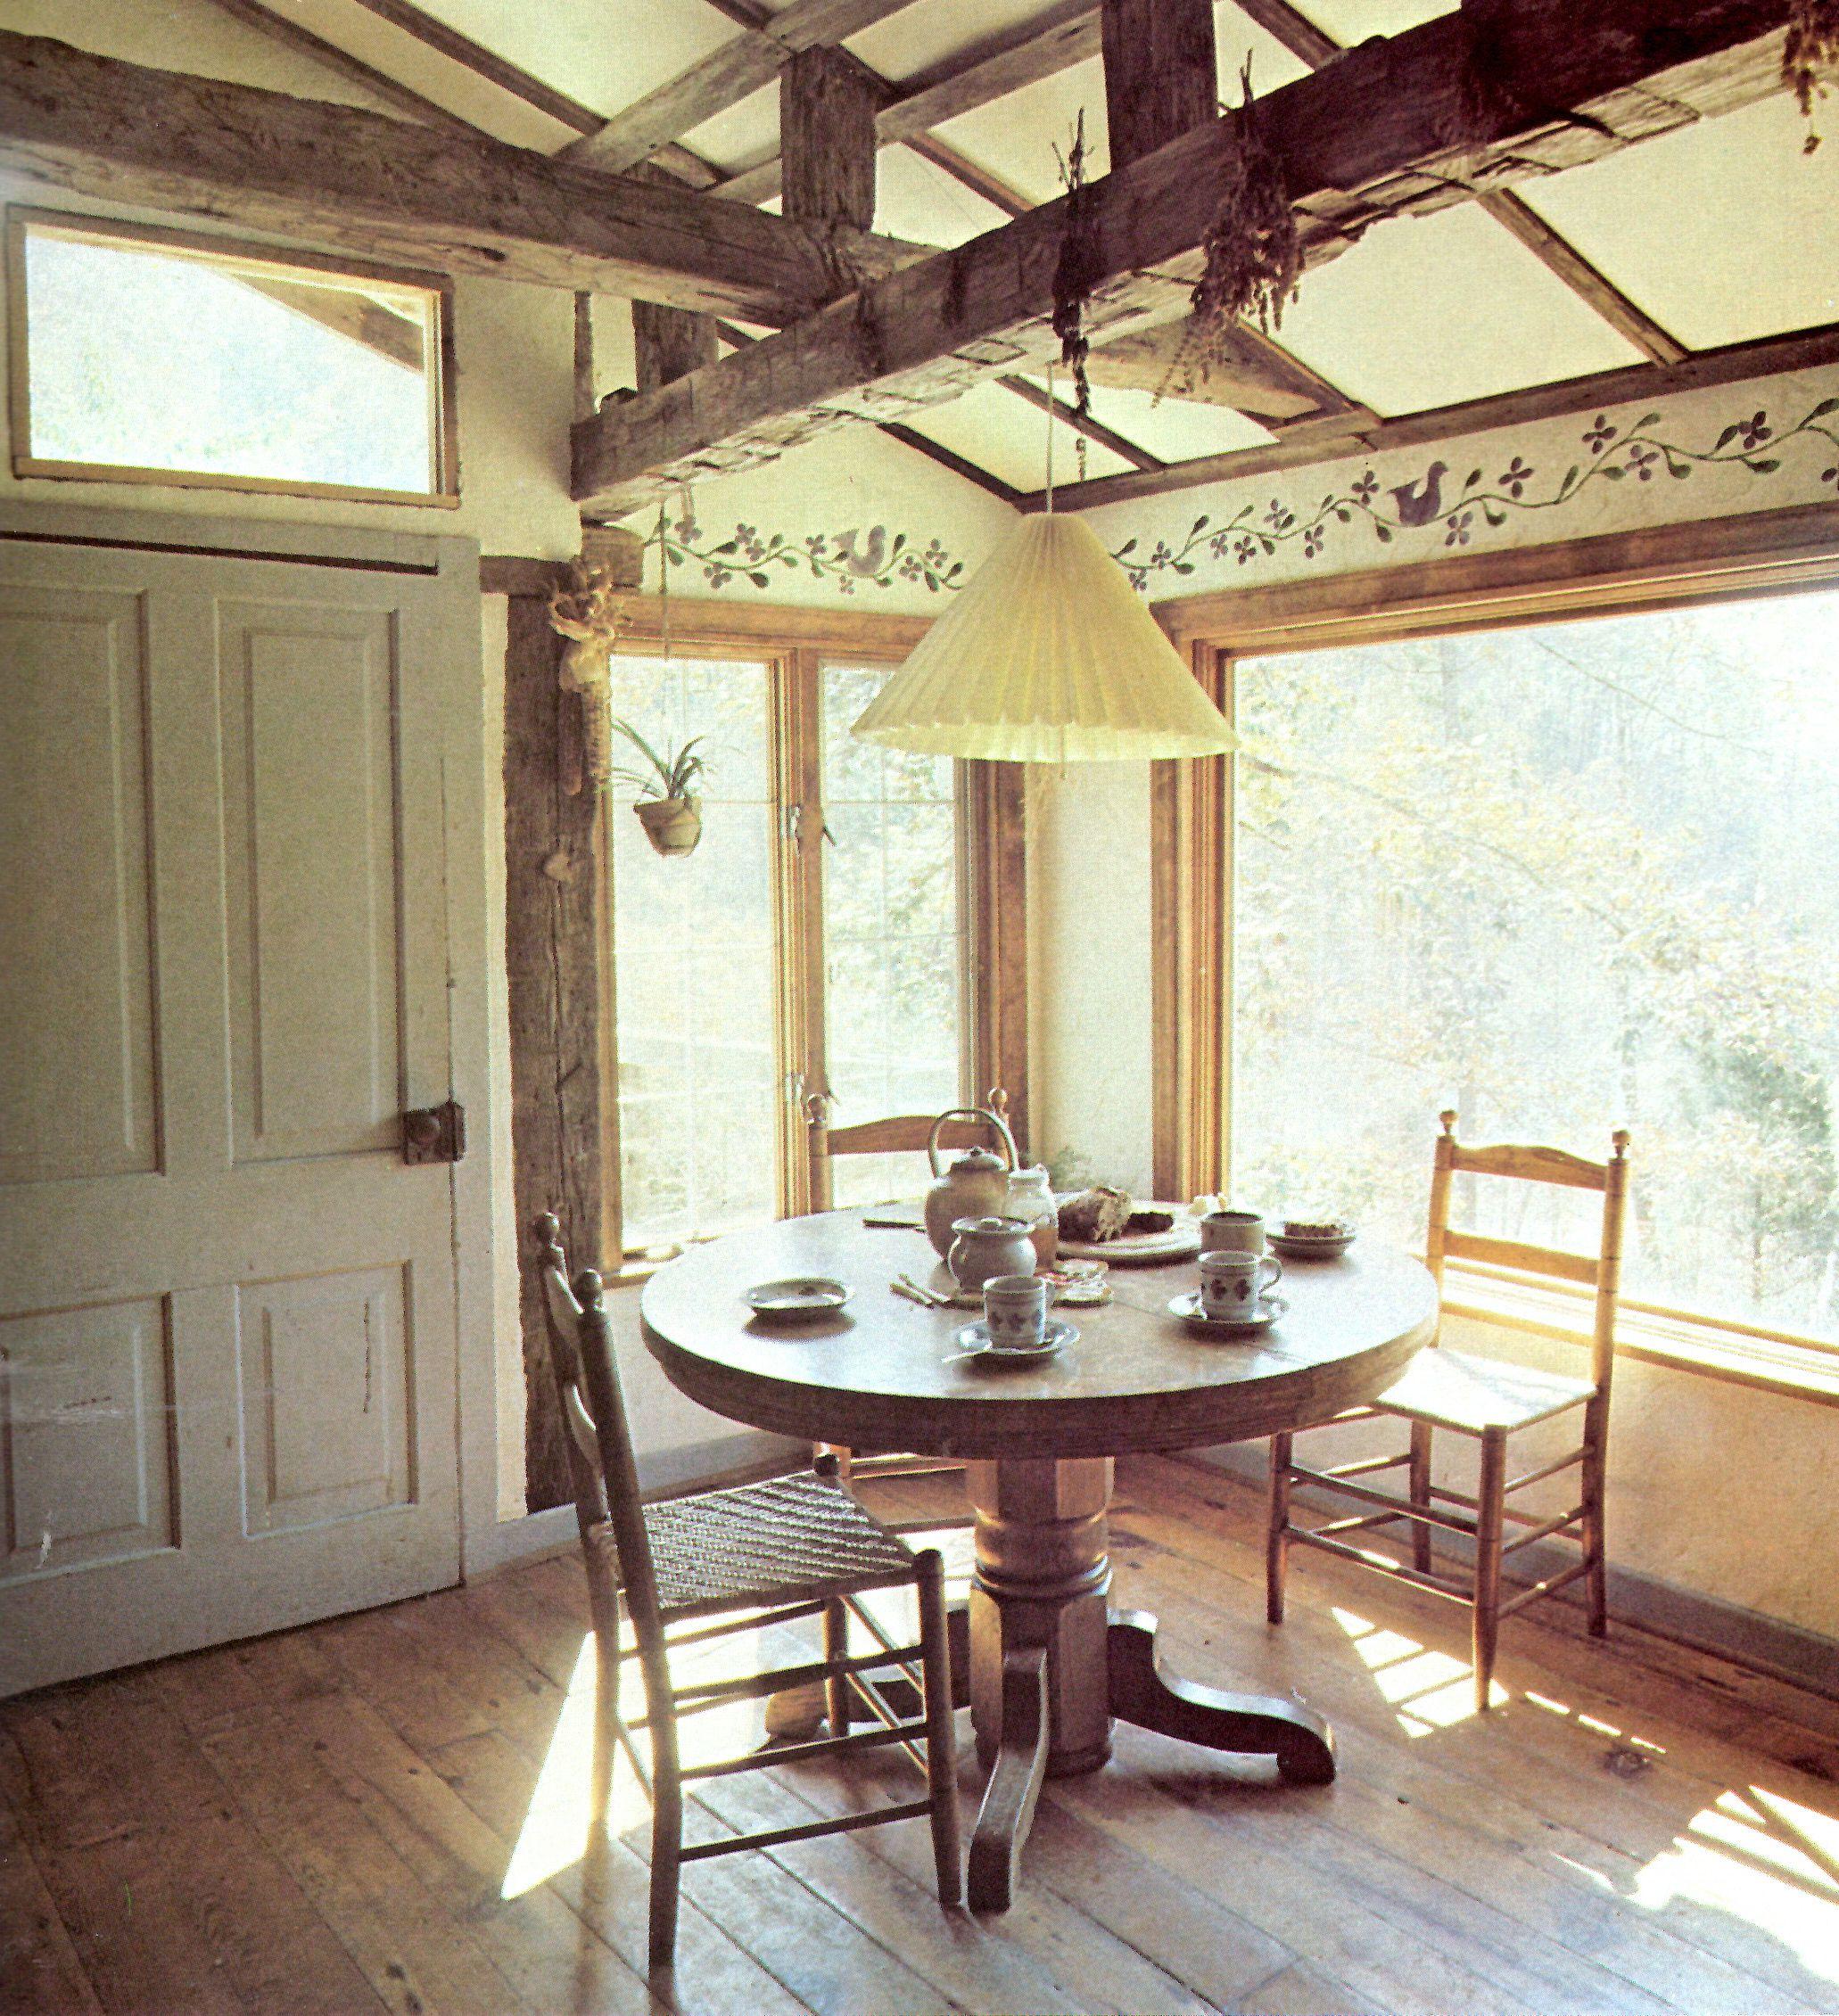 boho decor dining room cottage style decor bohemian dining room boho interior design on boho chic kitchen table decor id=11299